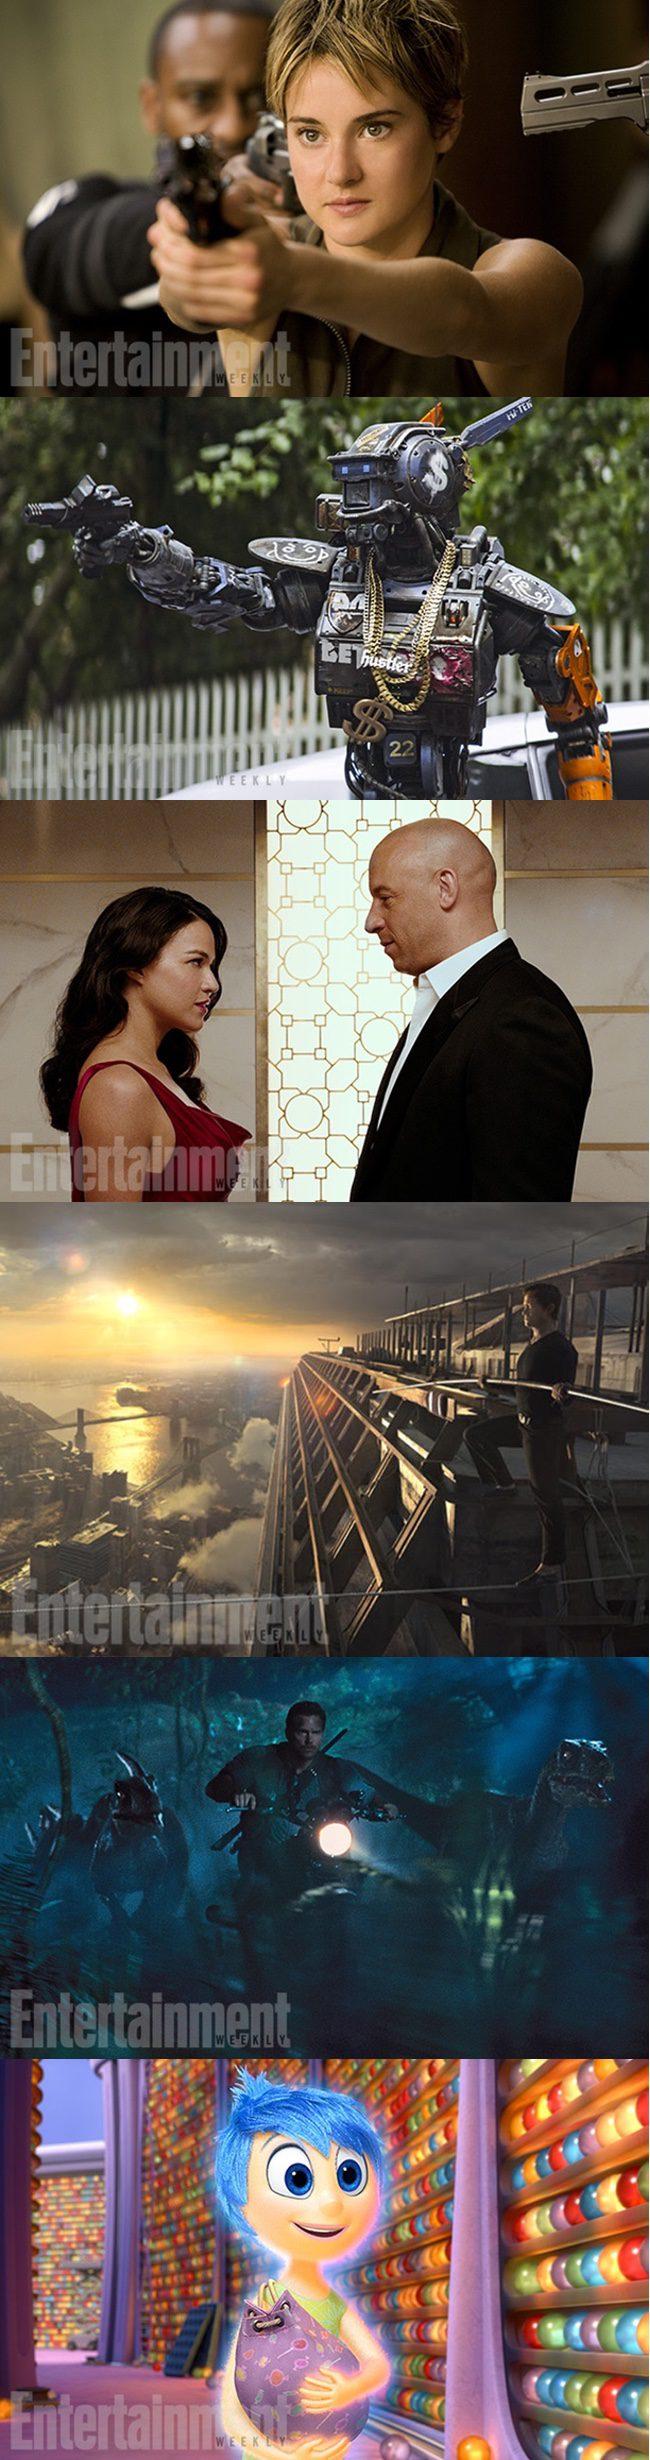 Nuevas imágenes de 'La serie Divergente: Insurgente', 'Chappie', 'Furious 7', 'The Walk', 'Jurassic World' e 'Inside Out'